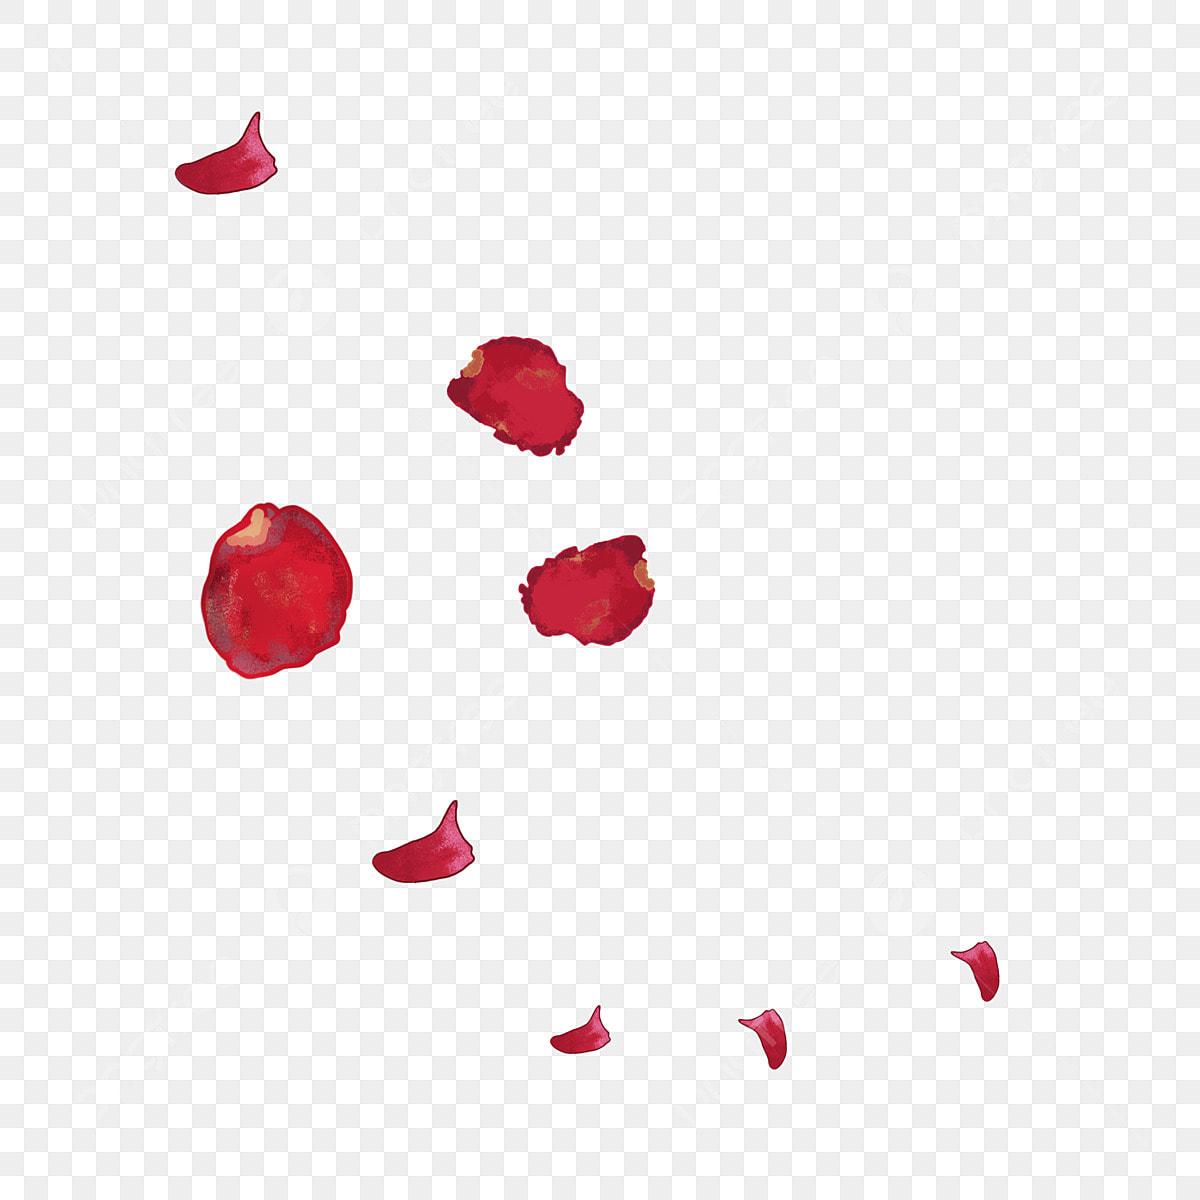 Bunga Merah Kelopak Terapung Bunga Cantik Bunga Jatuh Ilustrasi